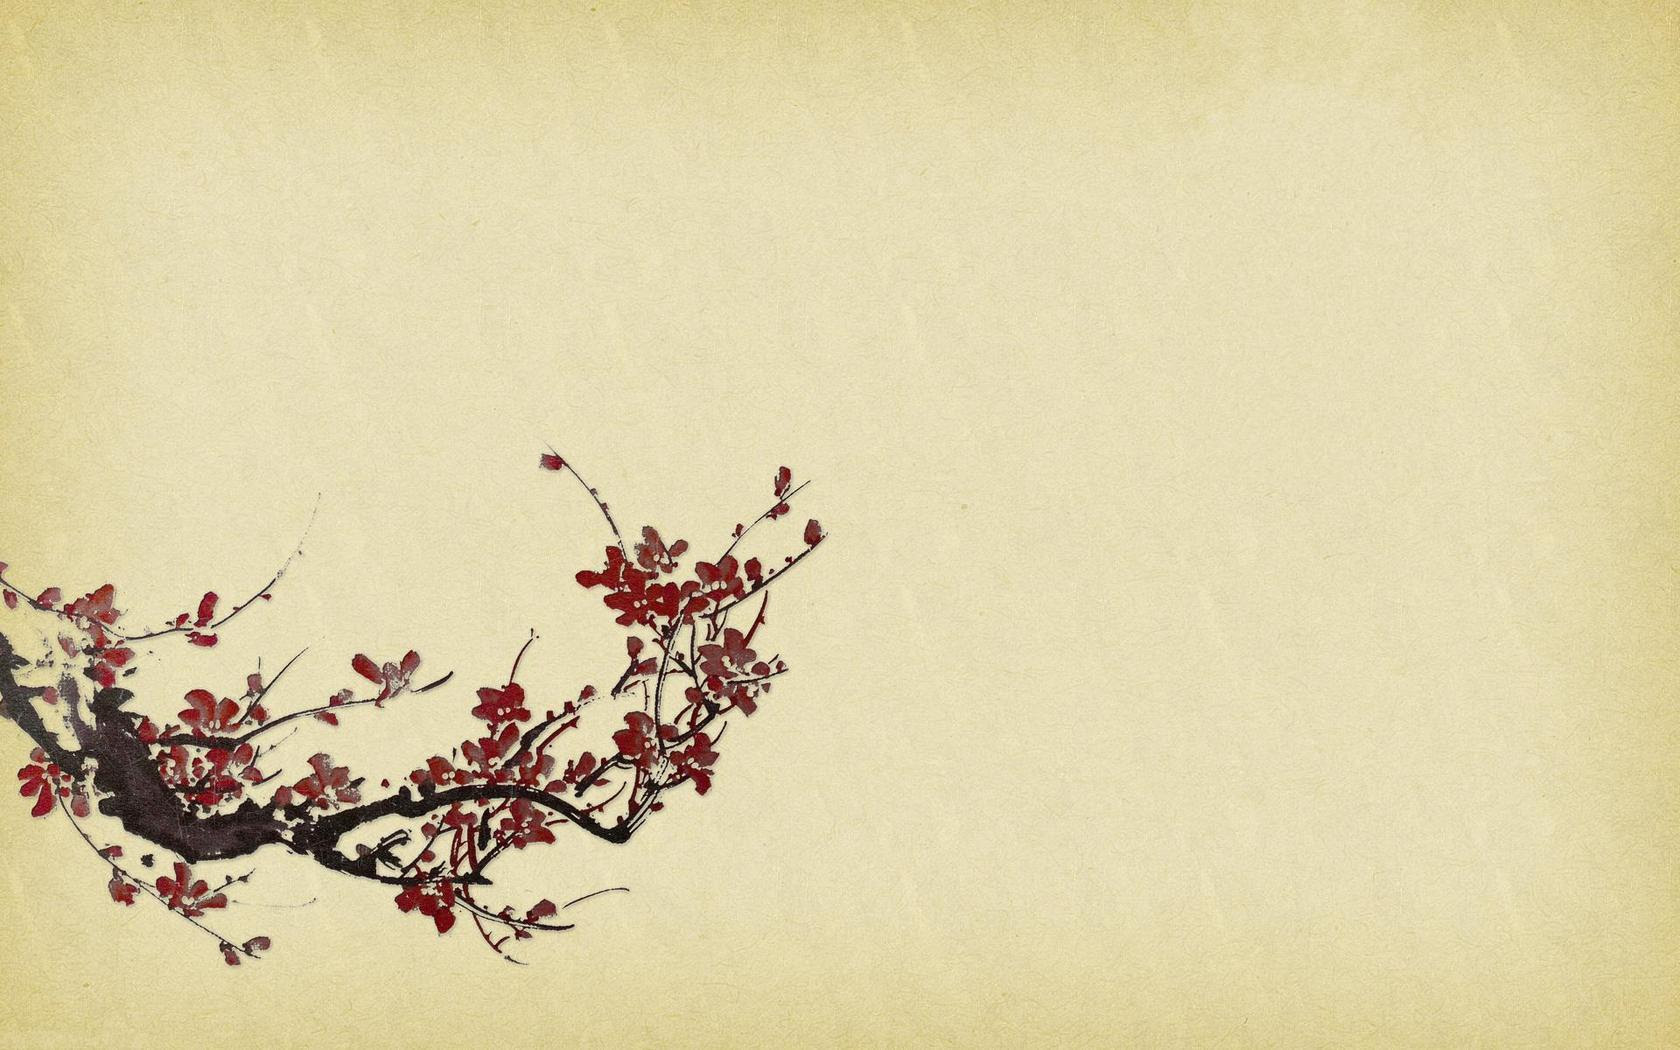 Japanese Art Wallpapers - Wallpaper Cave